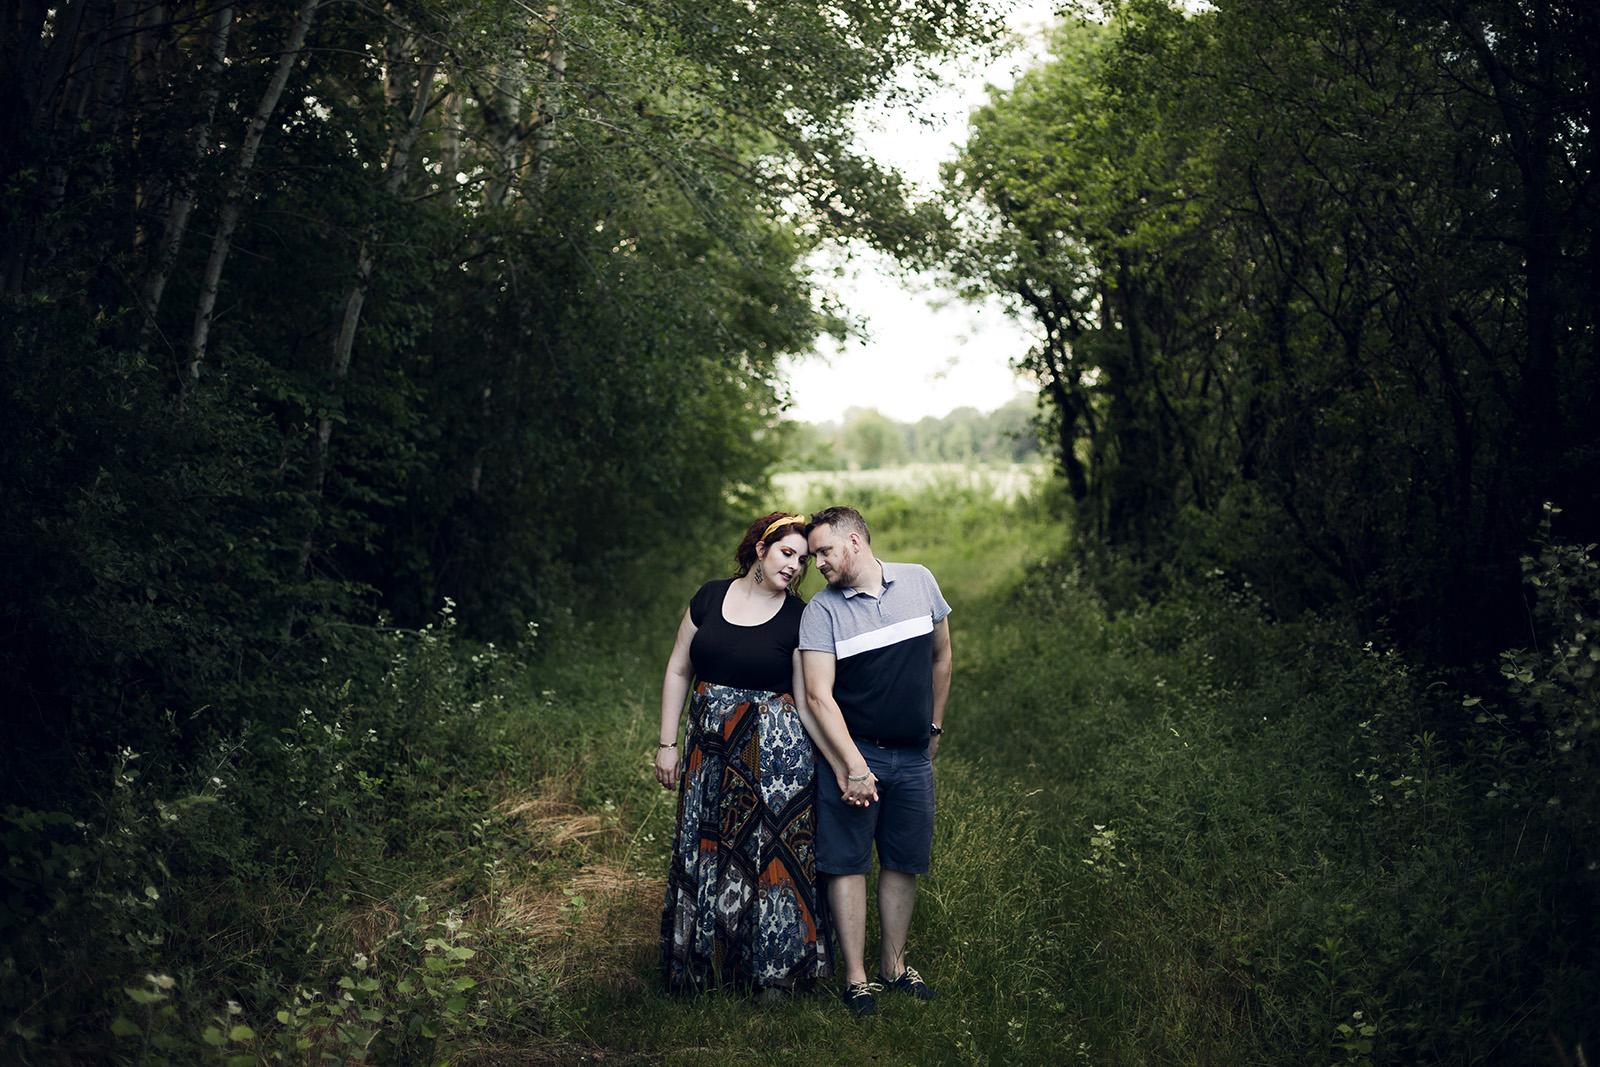 seance-photo-engagement-love-session-mariage-wedding-photographe-photographer-lyon-auvergne-rhone-alpes-couple-save-the-date-shooting-photoshoot-reportage-7